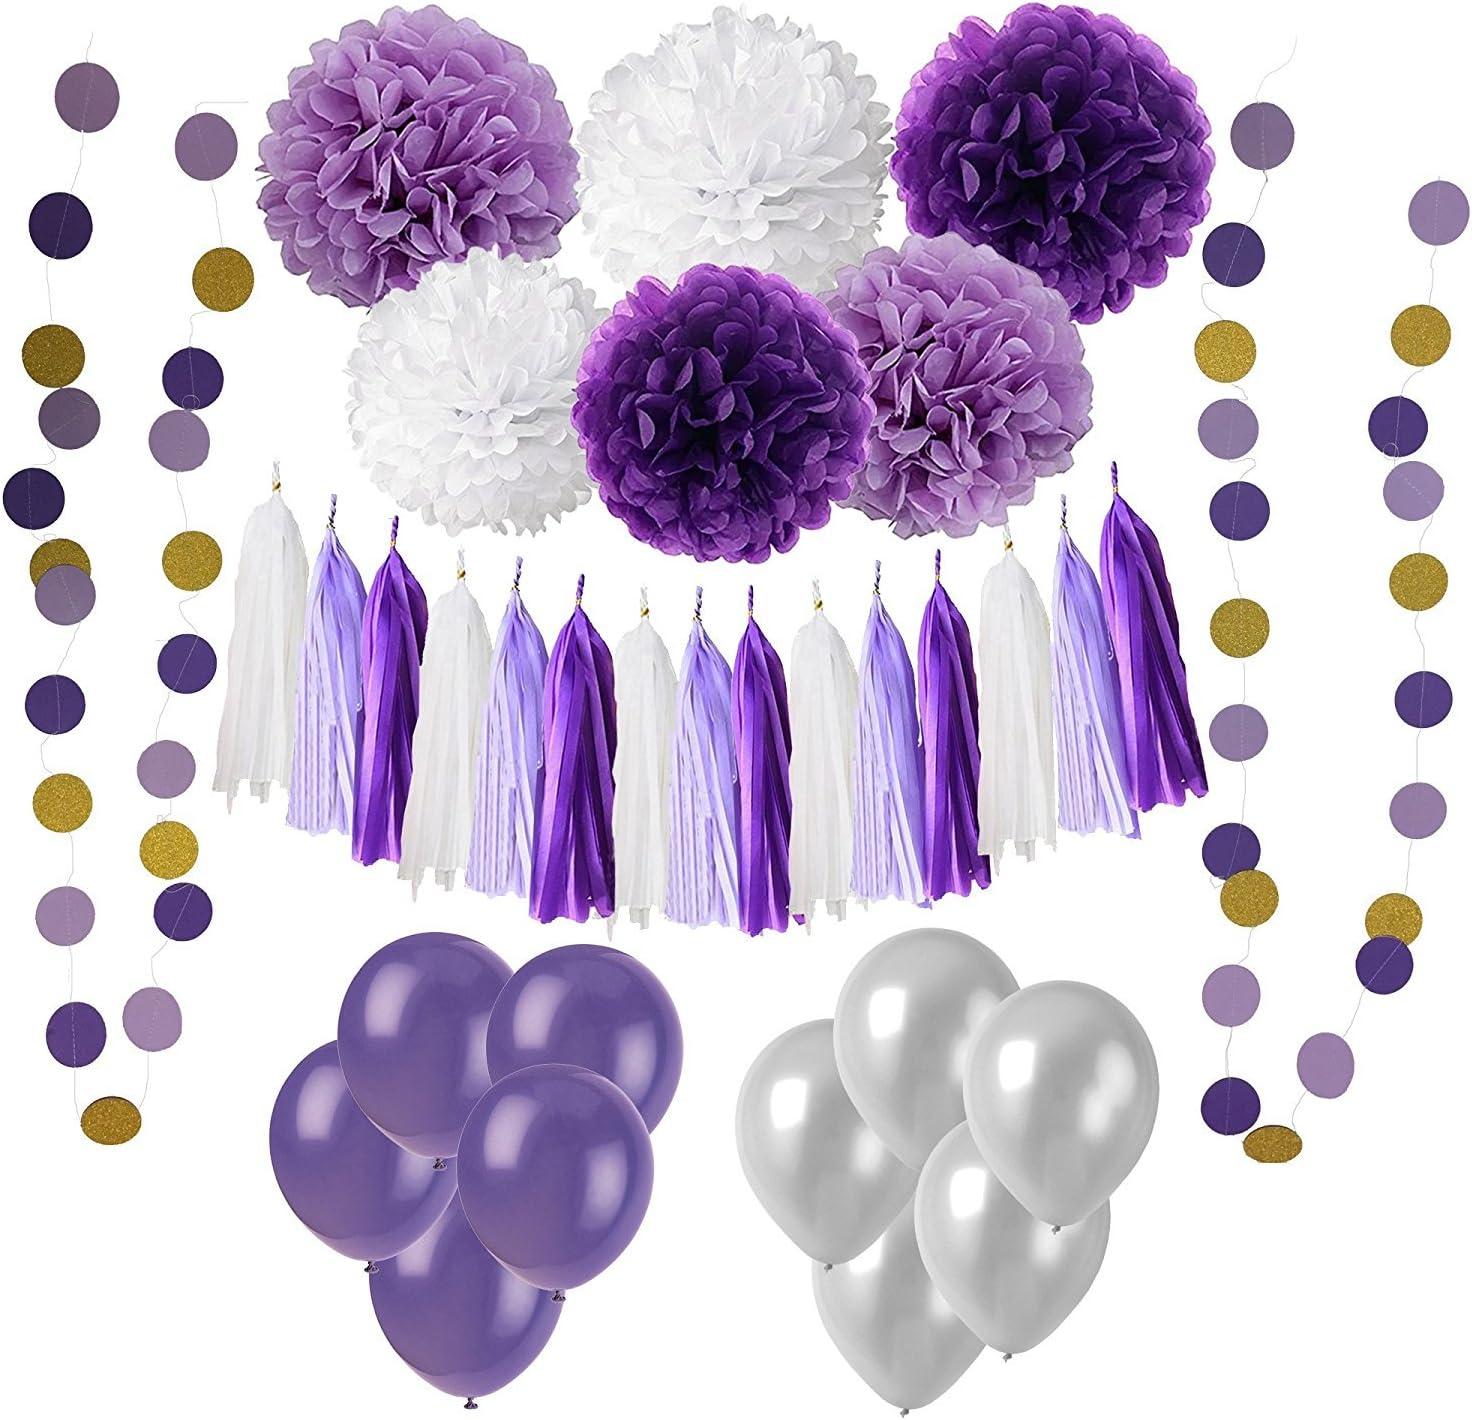 20x lilac paper pom poms purple lanterns wedding party birthday venue decoration